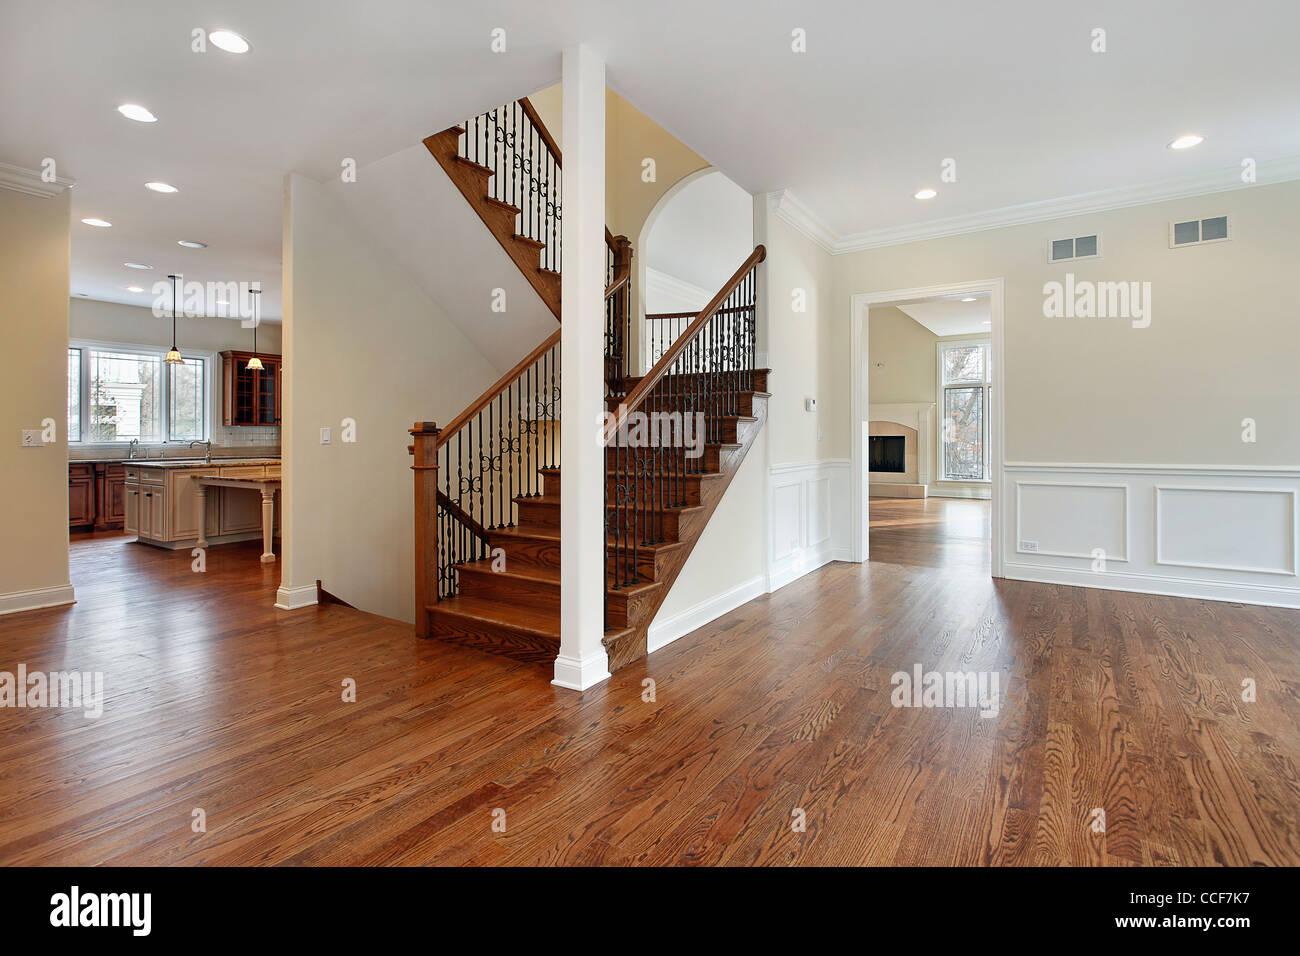 Foyer im Neubau Haus mit Treppe Stockfoto, Bild: 42131915 - Alamy